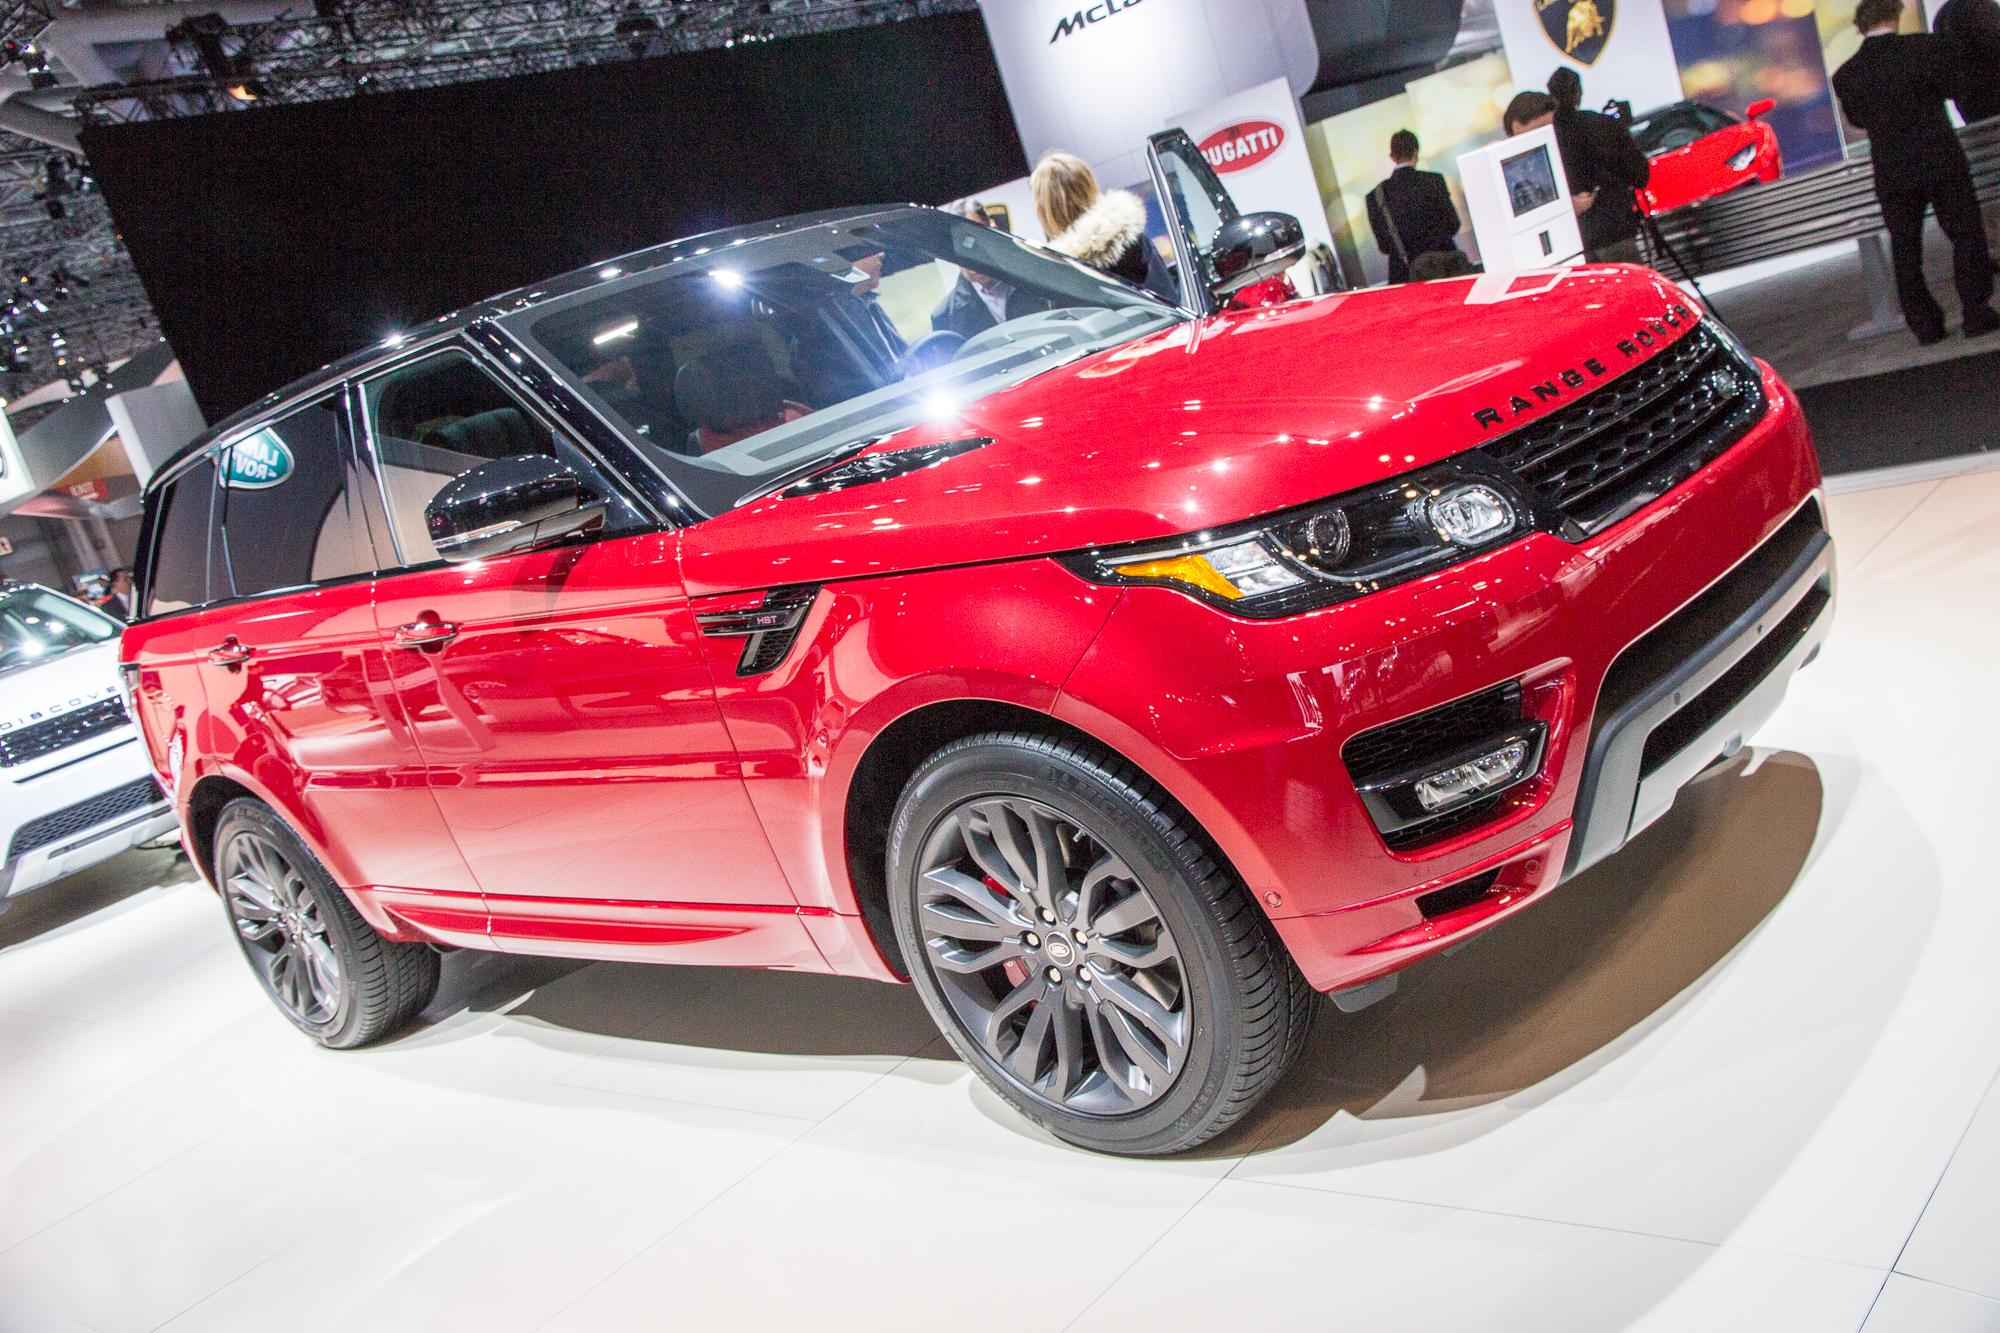 2016 Range Rover Sport HST Limited Edition 2015 New York Auto